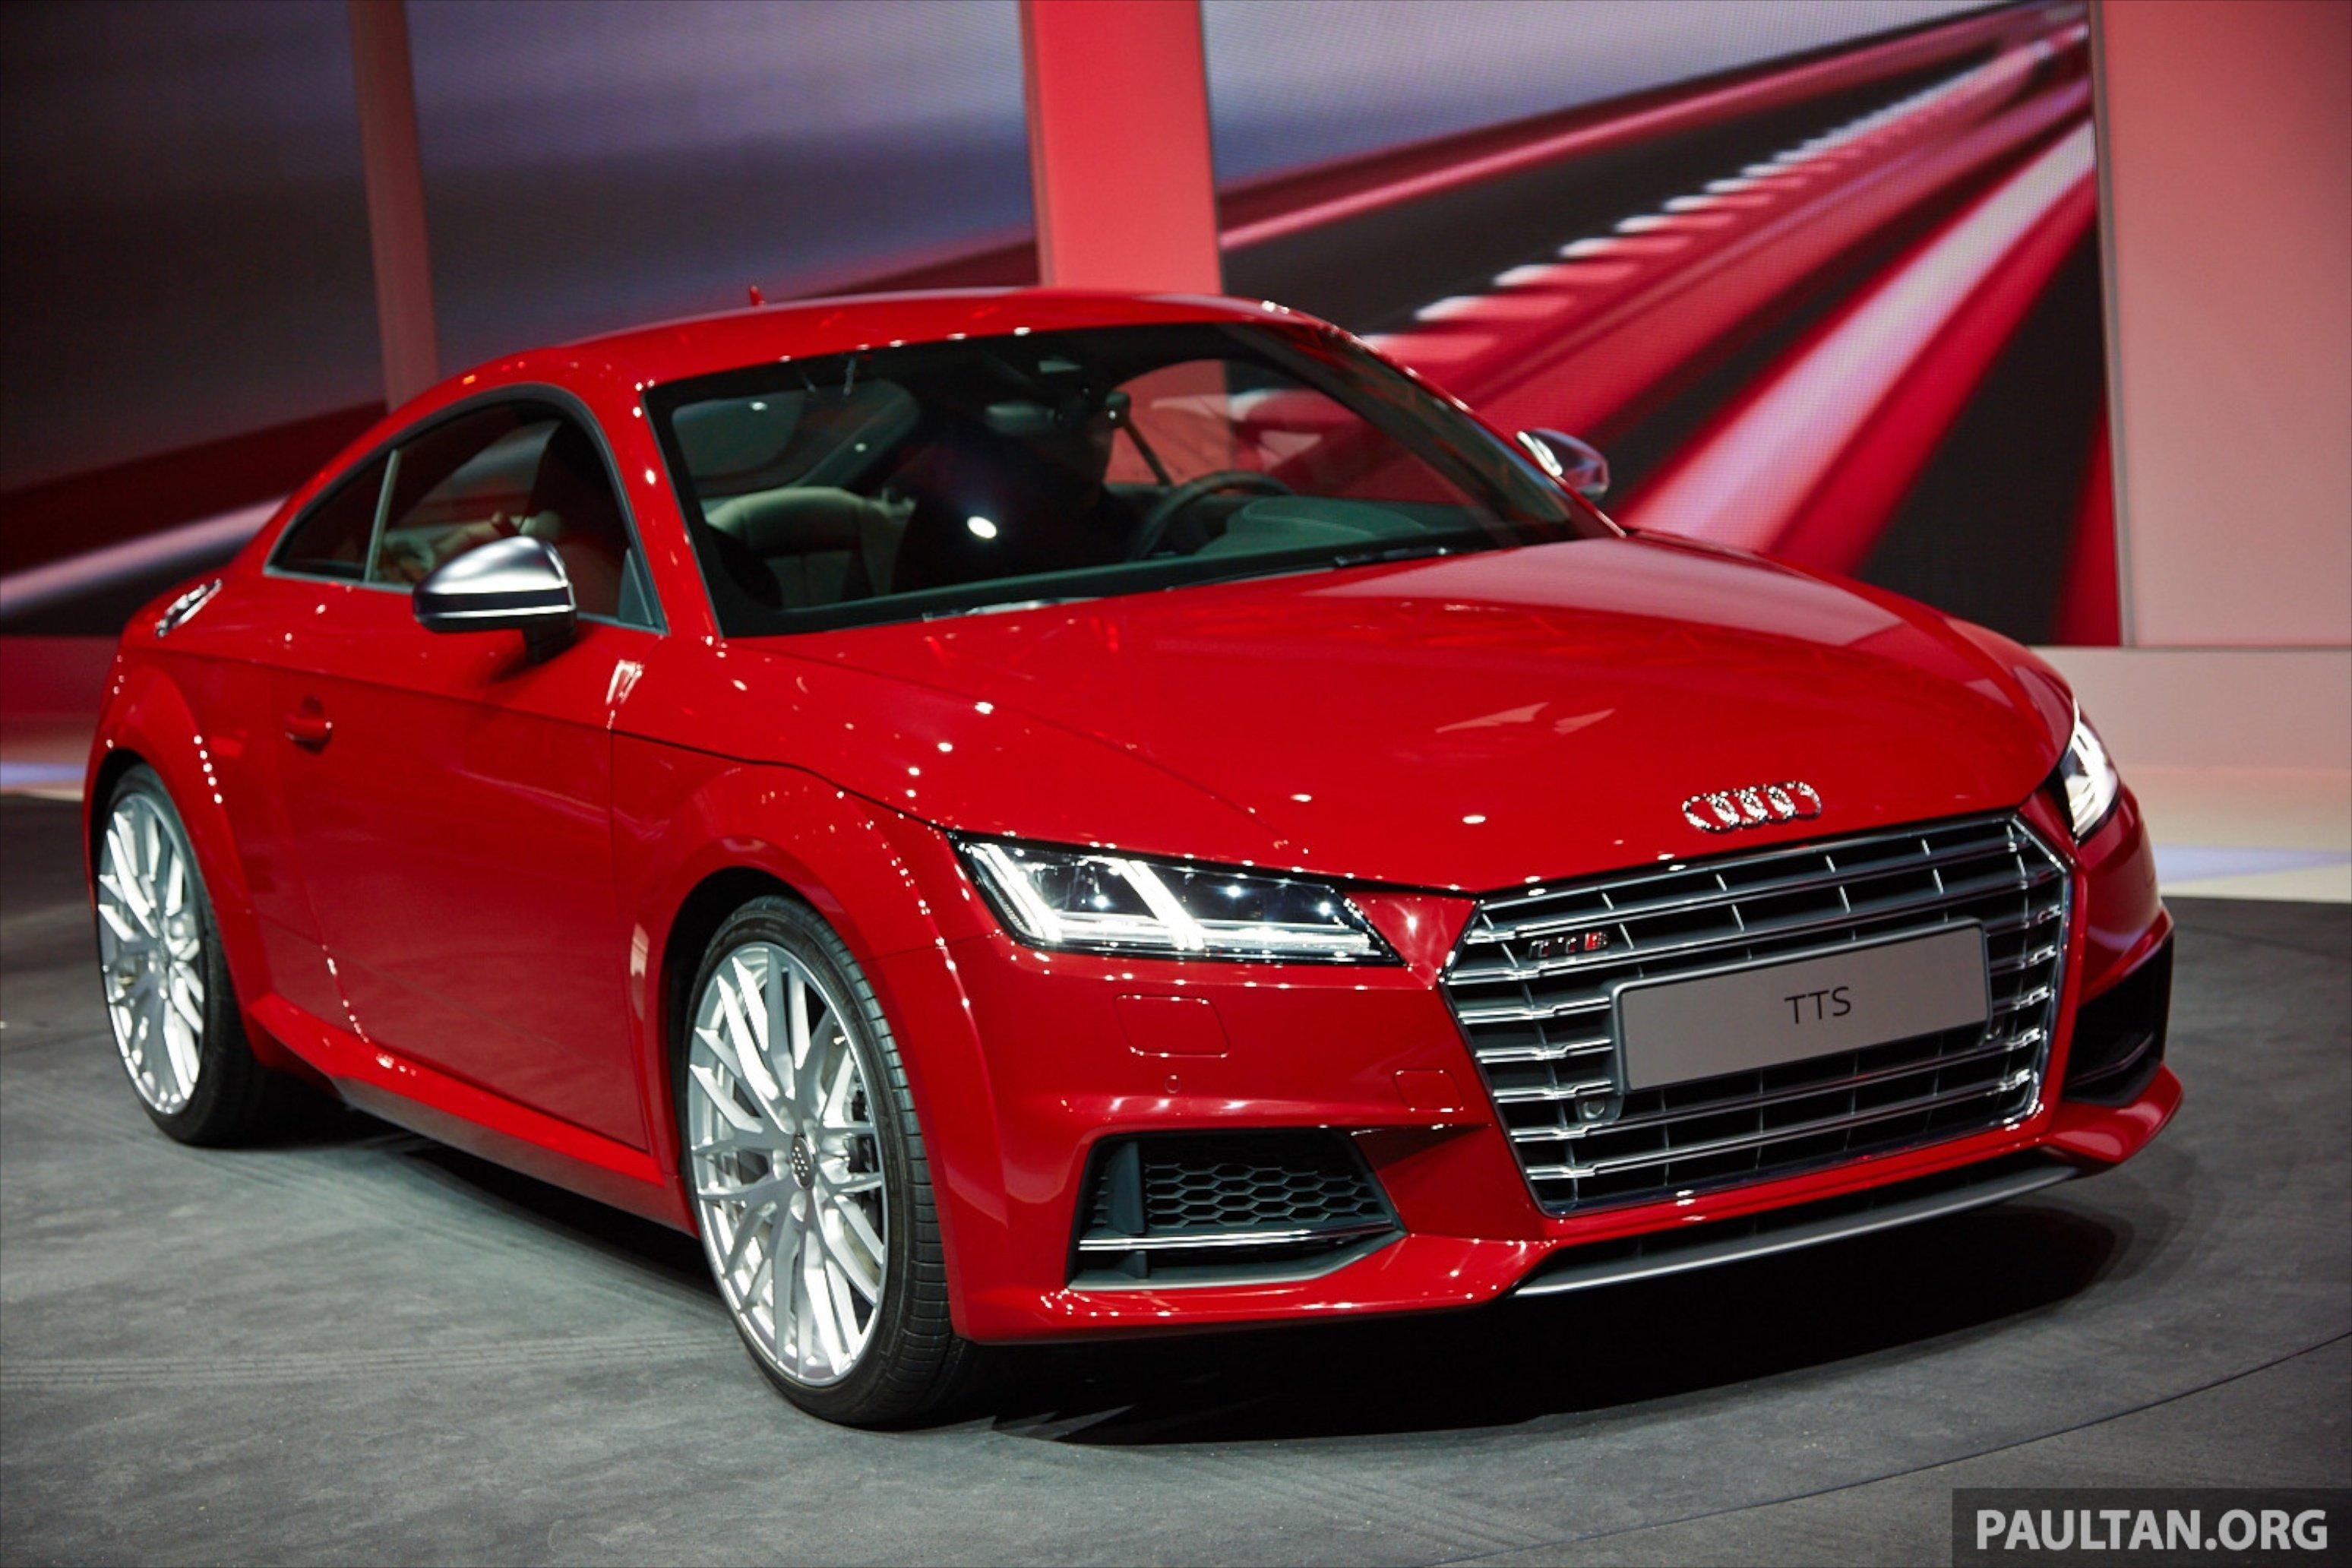 New Audi Tt And Tts Make Their Debut At Geneva Image 232413